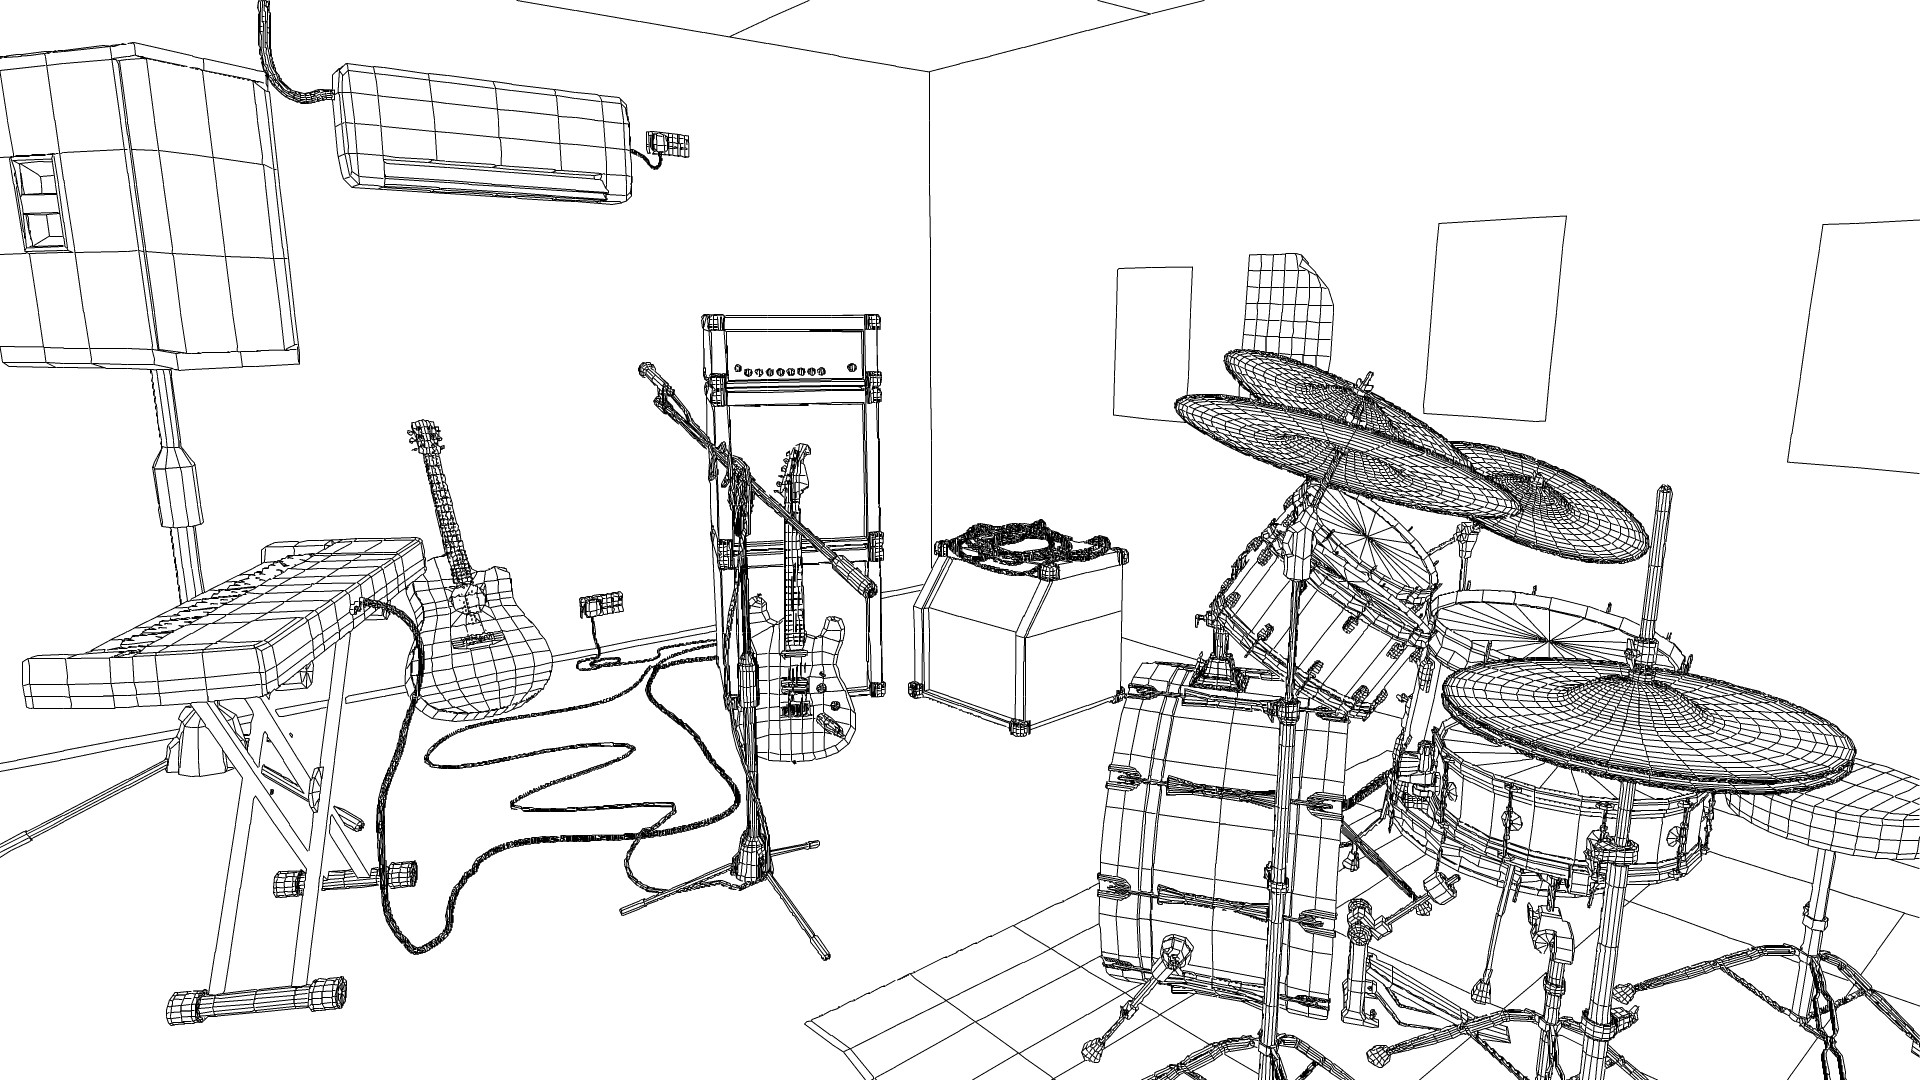 medium resolution of kyle tew the band roomkyle tew dan143 1 2 interior tewkaien 09